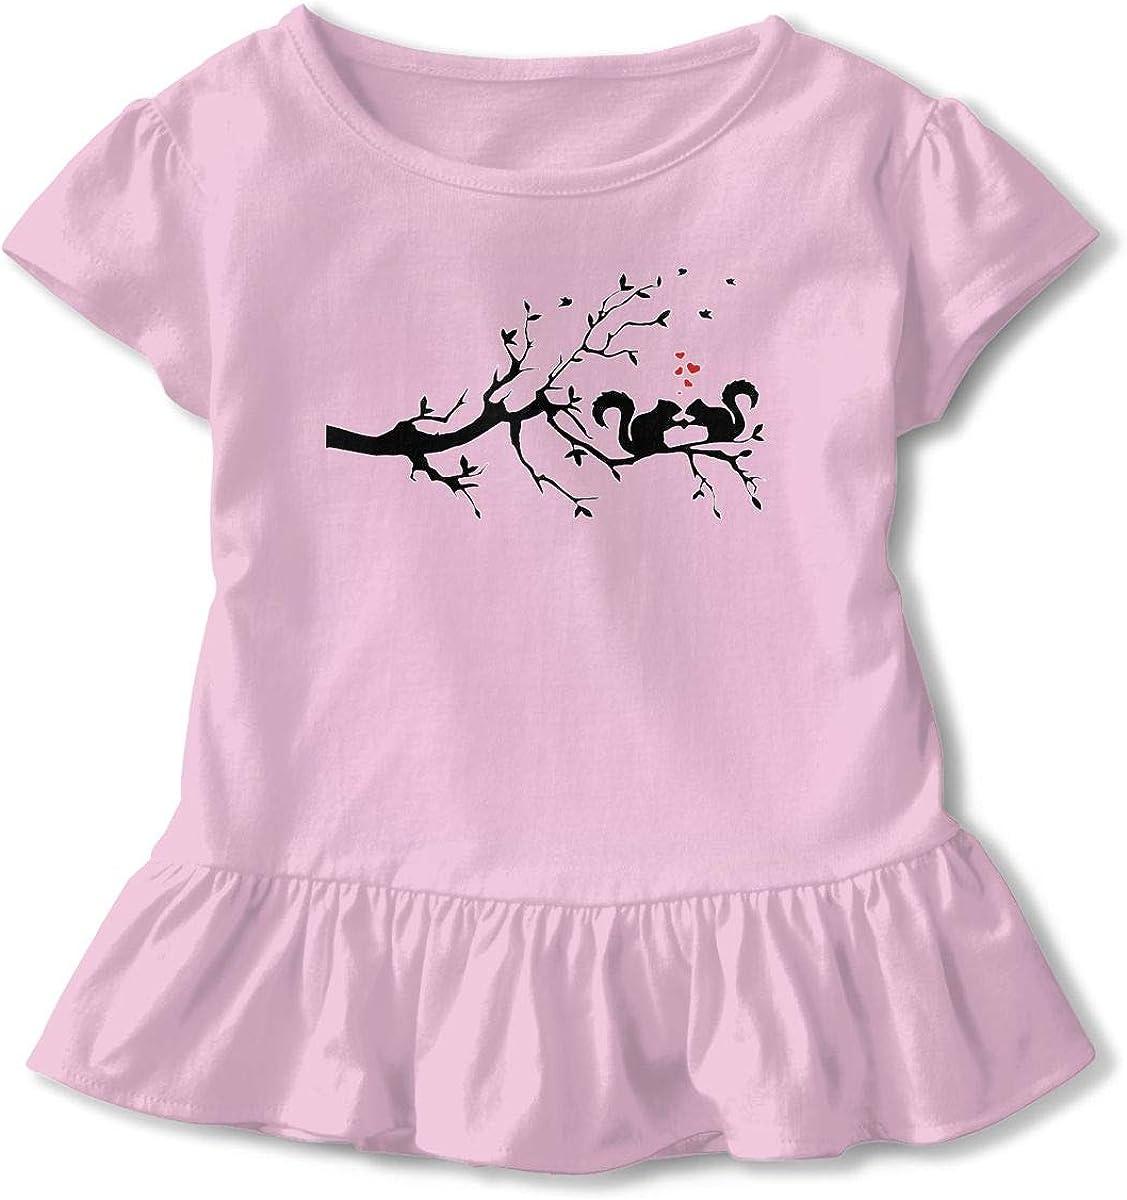 Squirrel Love Baby Skirts Cute Kids T Shirt Dress Cotton Flounces Costume